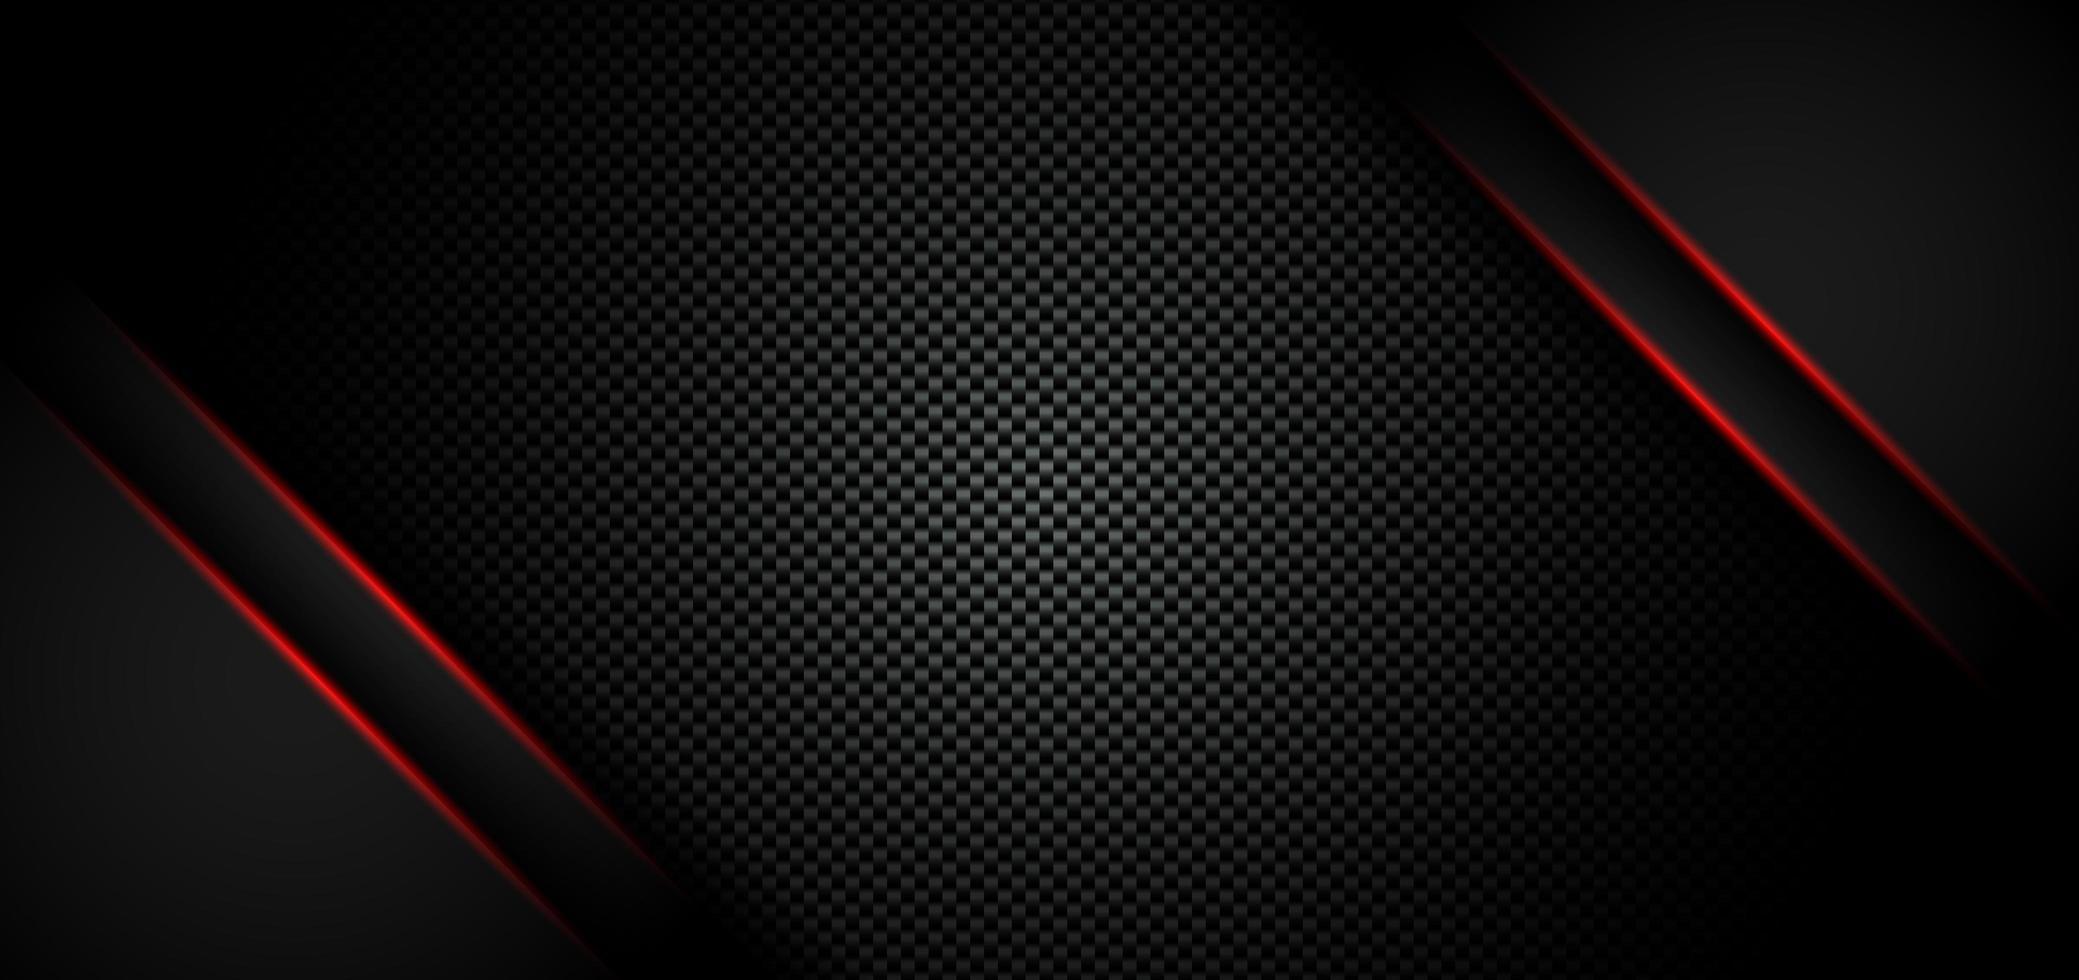 abstract metallic rood glanzend kleur zwart frame lay-out moderne tech ontwerpsjabloon op koolstofvezel materiële achtergrond en textuur vector